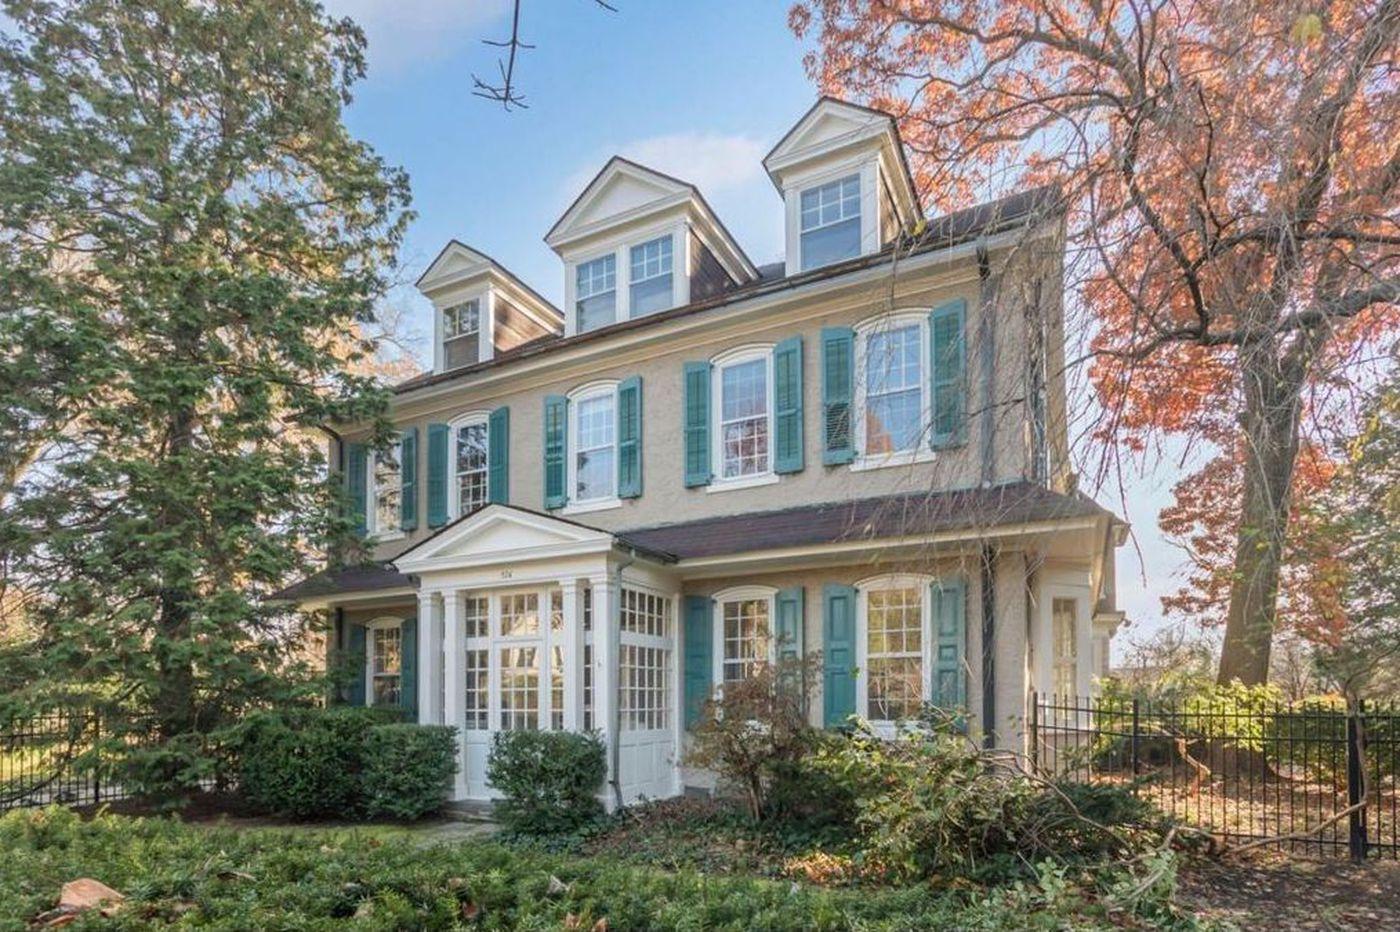 Once an Inn, now a family home in Philadelphia's Mount Airy neighborhood